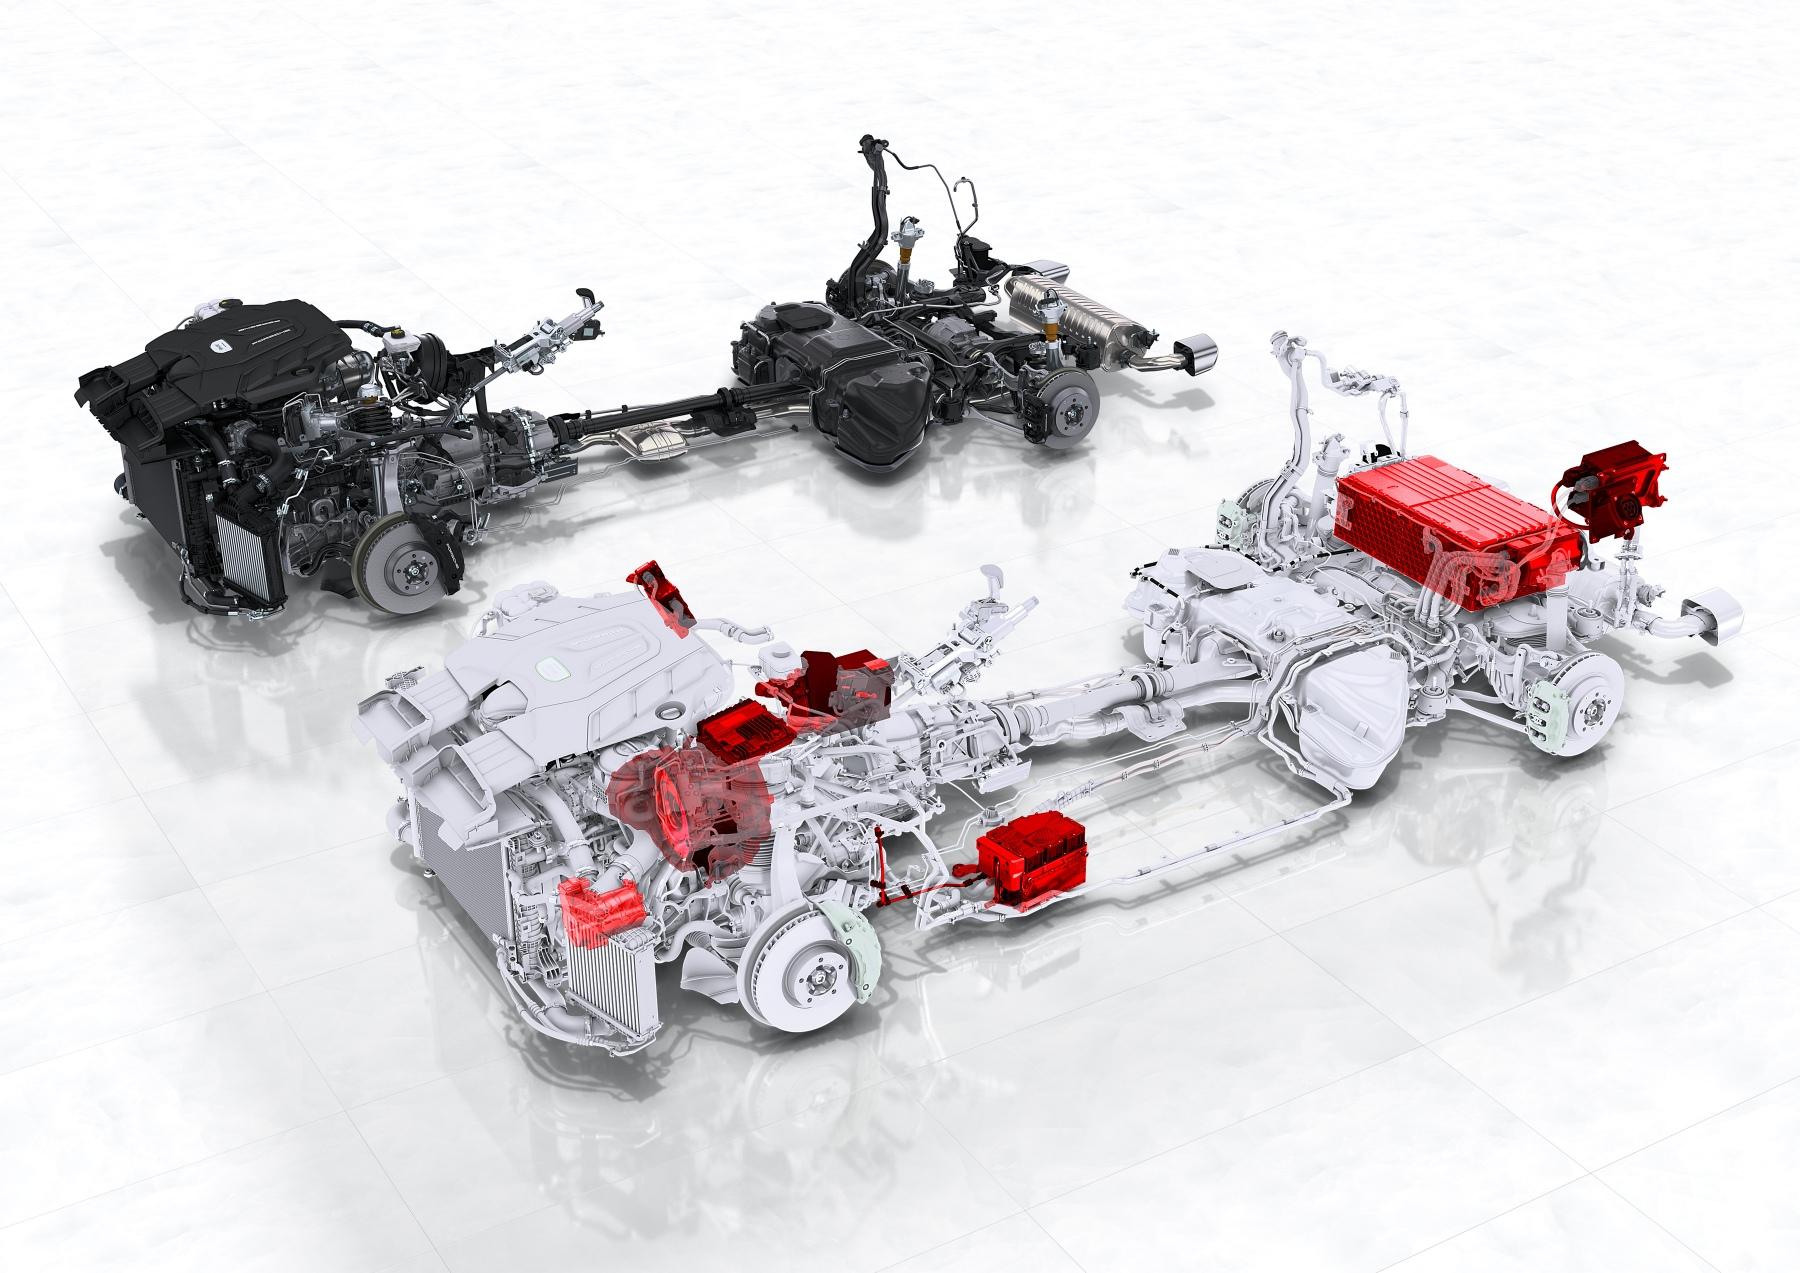 Technical Diagrams Porsche Cayenne E Hybrid Engine And Drivetrain Comparison